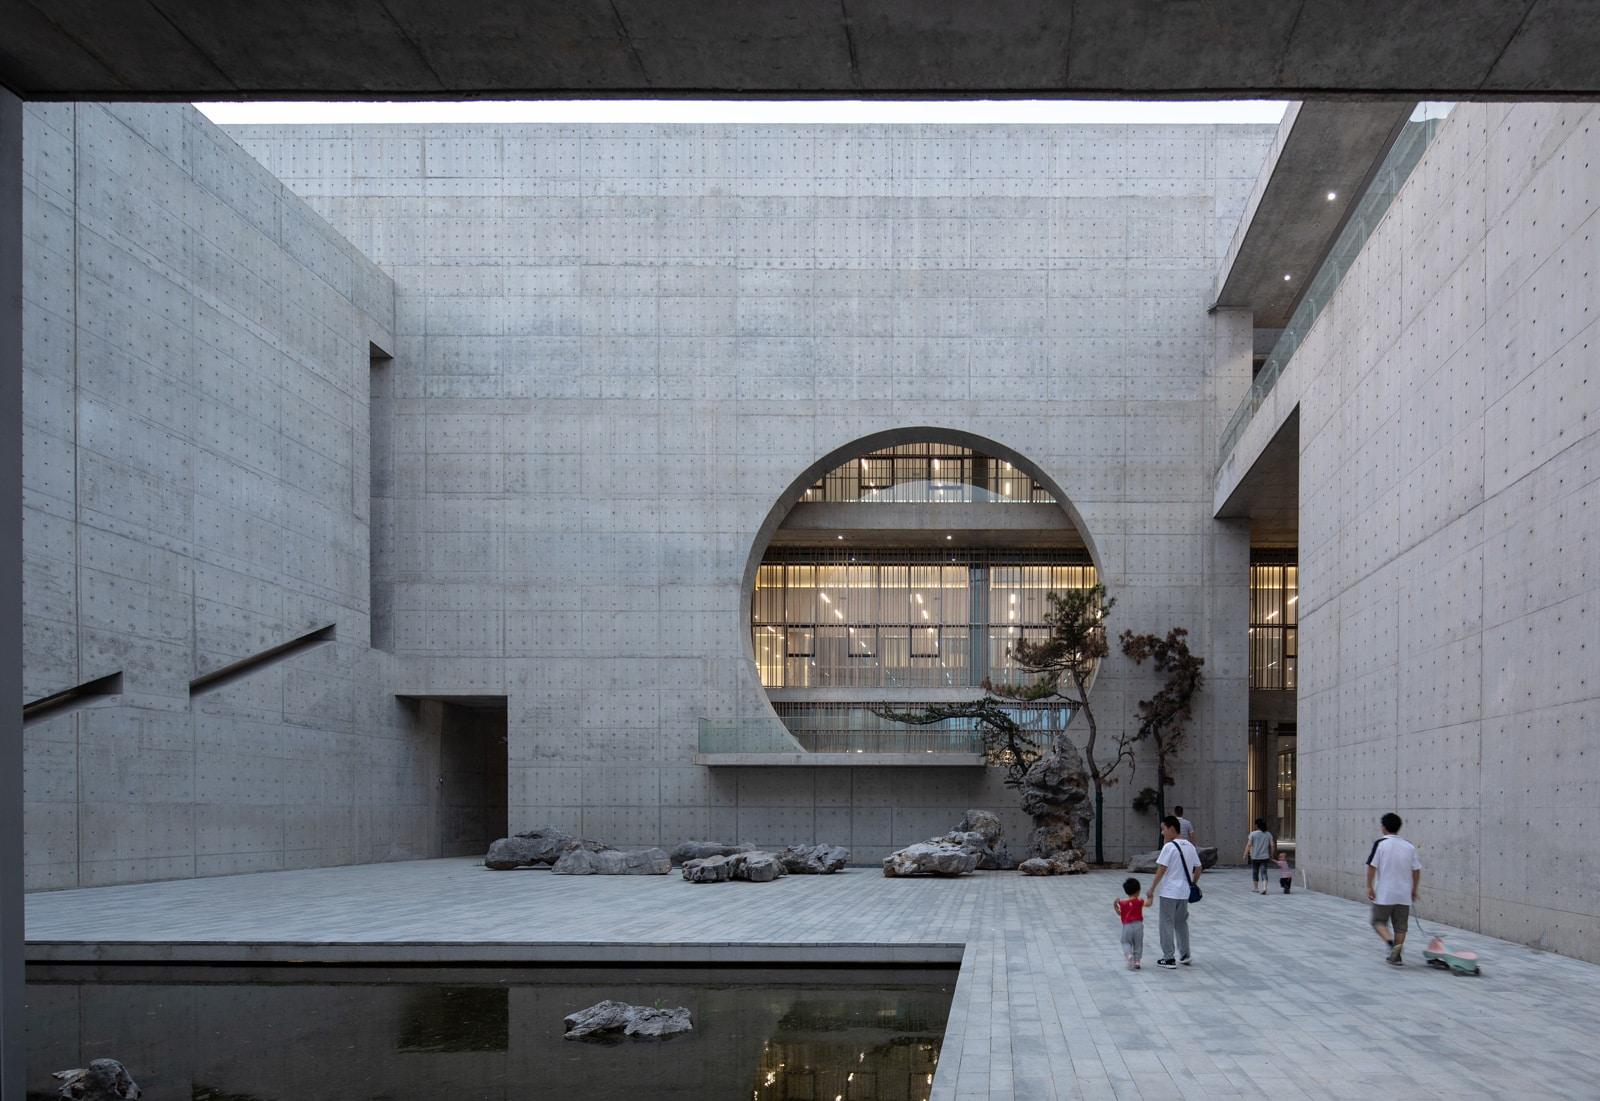 Shou County Culture and Art Center  - 20210702 Zhu Pei ShouCountyCultureArtCenter 03 35